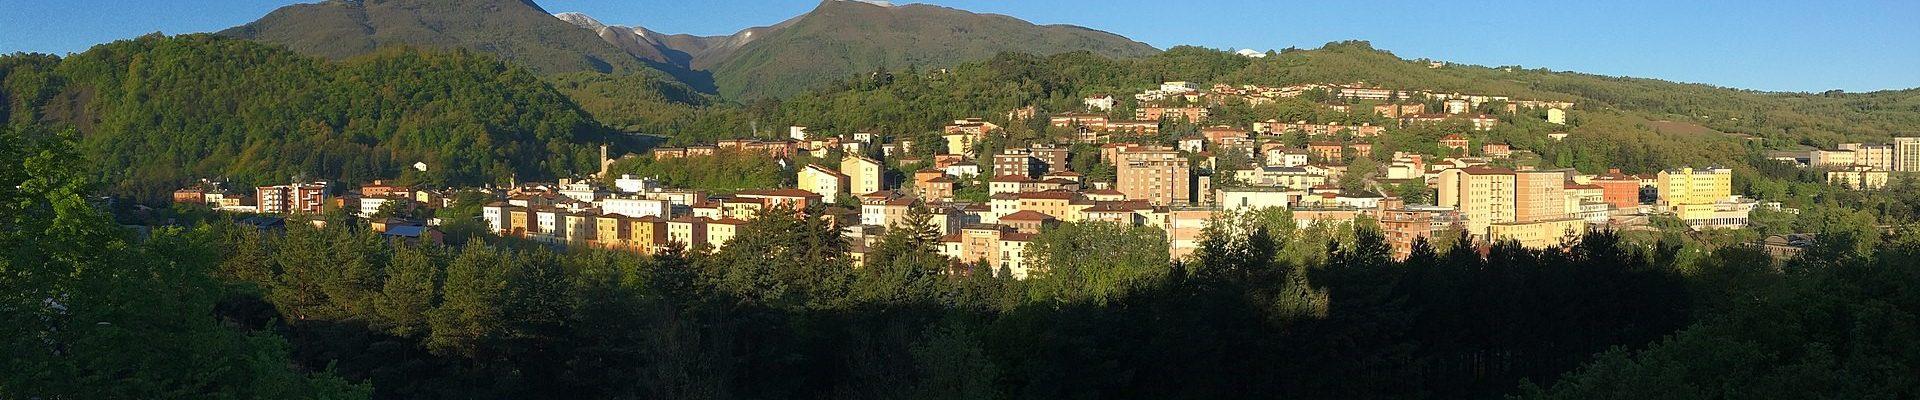 1920px-Porretta_Terme_-_panorama_180°